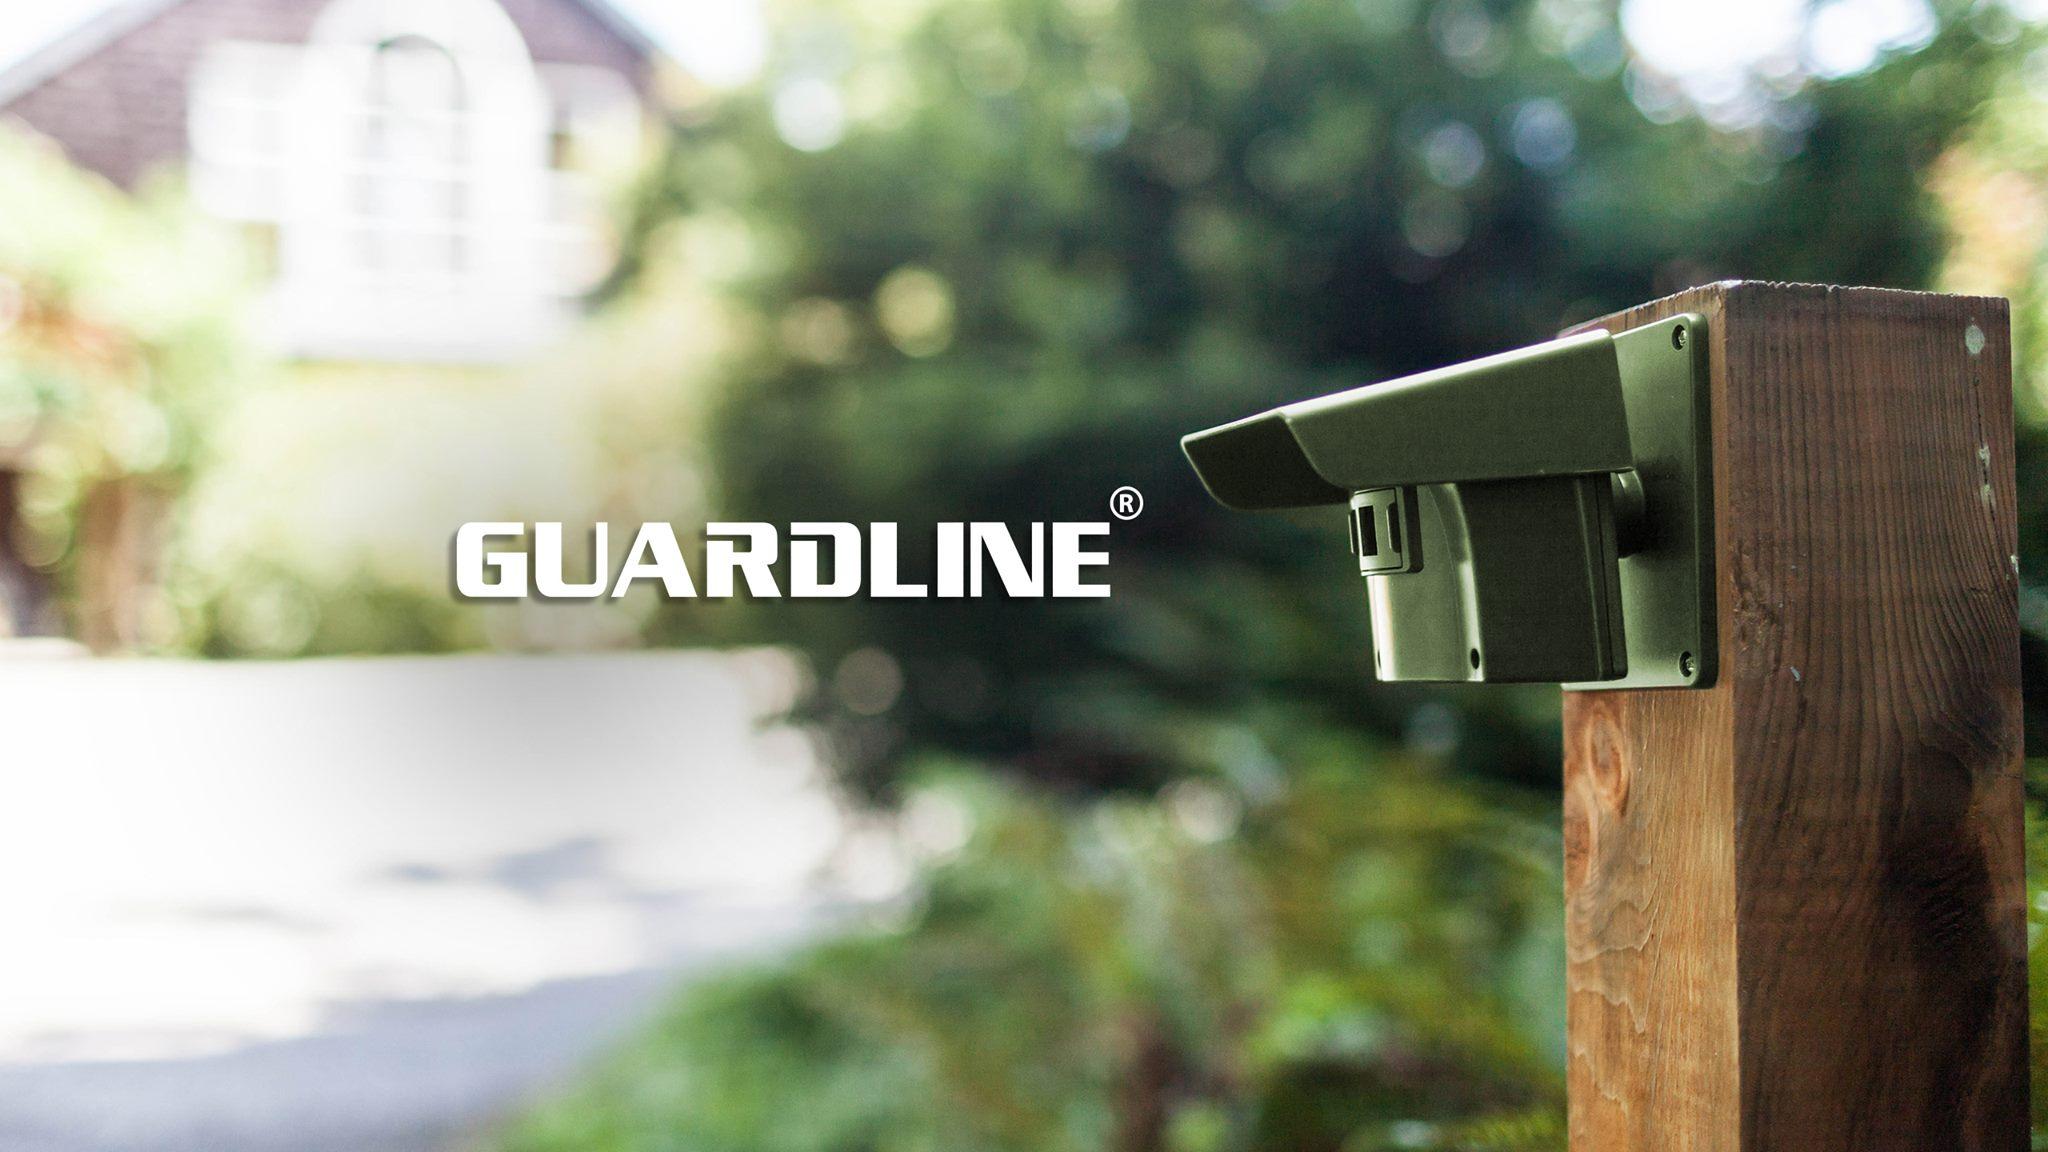 guardline security